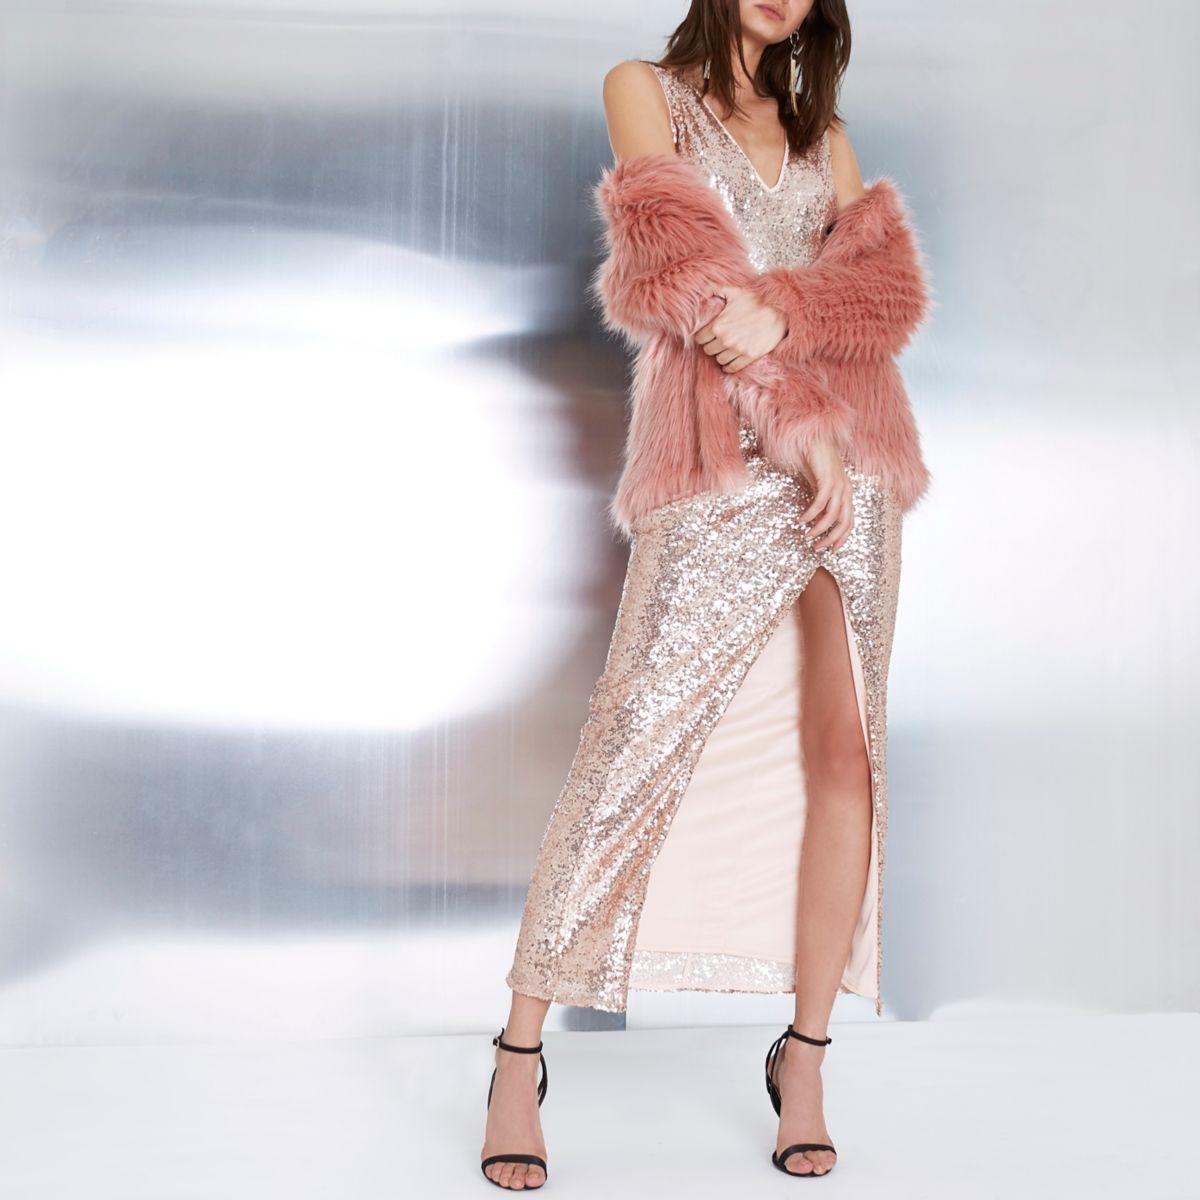 Rose gold metallic plunge bodycon maxi dress